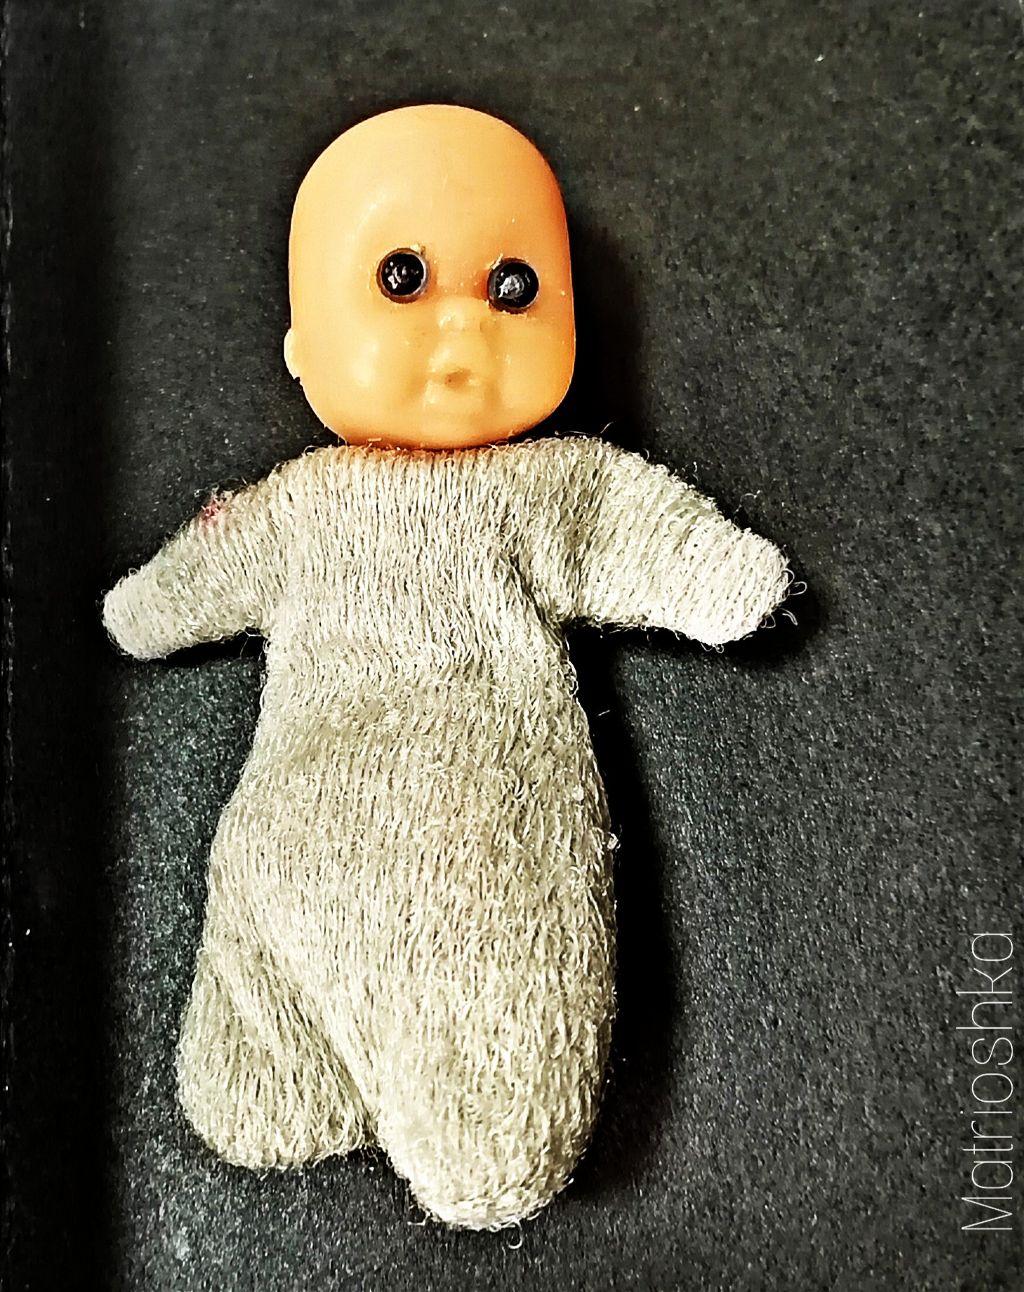 #freetoedit #nostalgic#childhood #doll #1984#myclick📷  افسوس که ناگهان چه زود دیر می شود